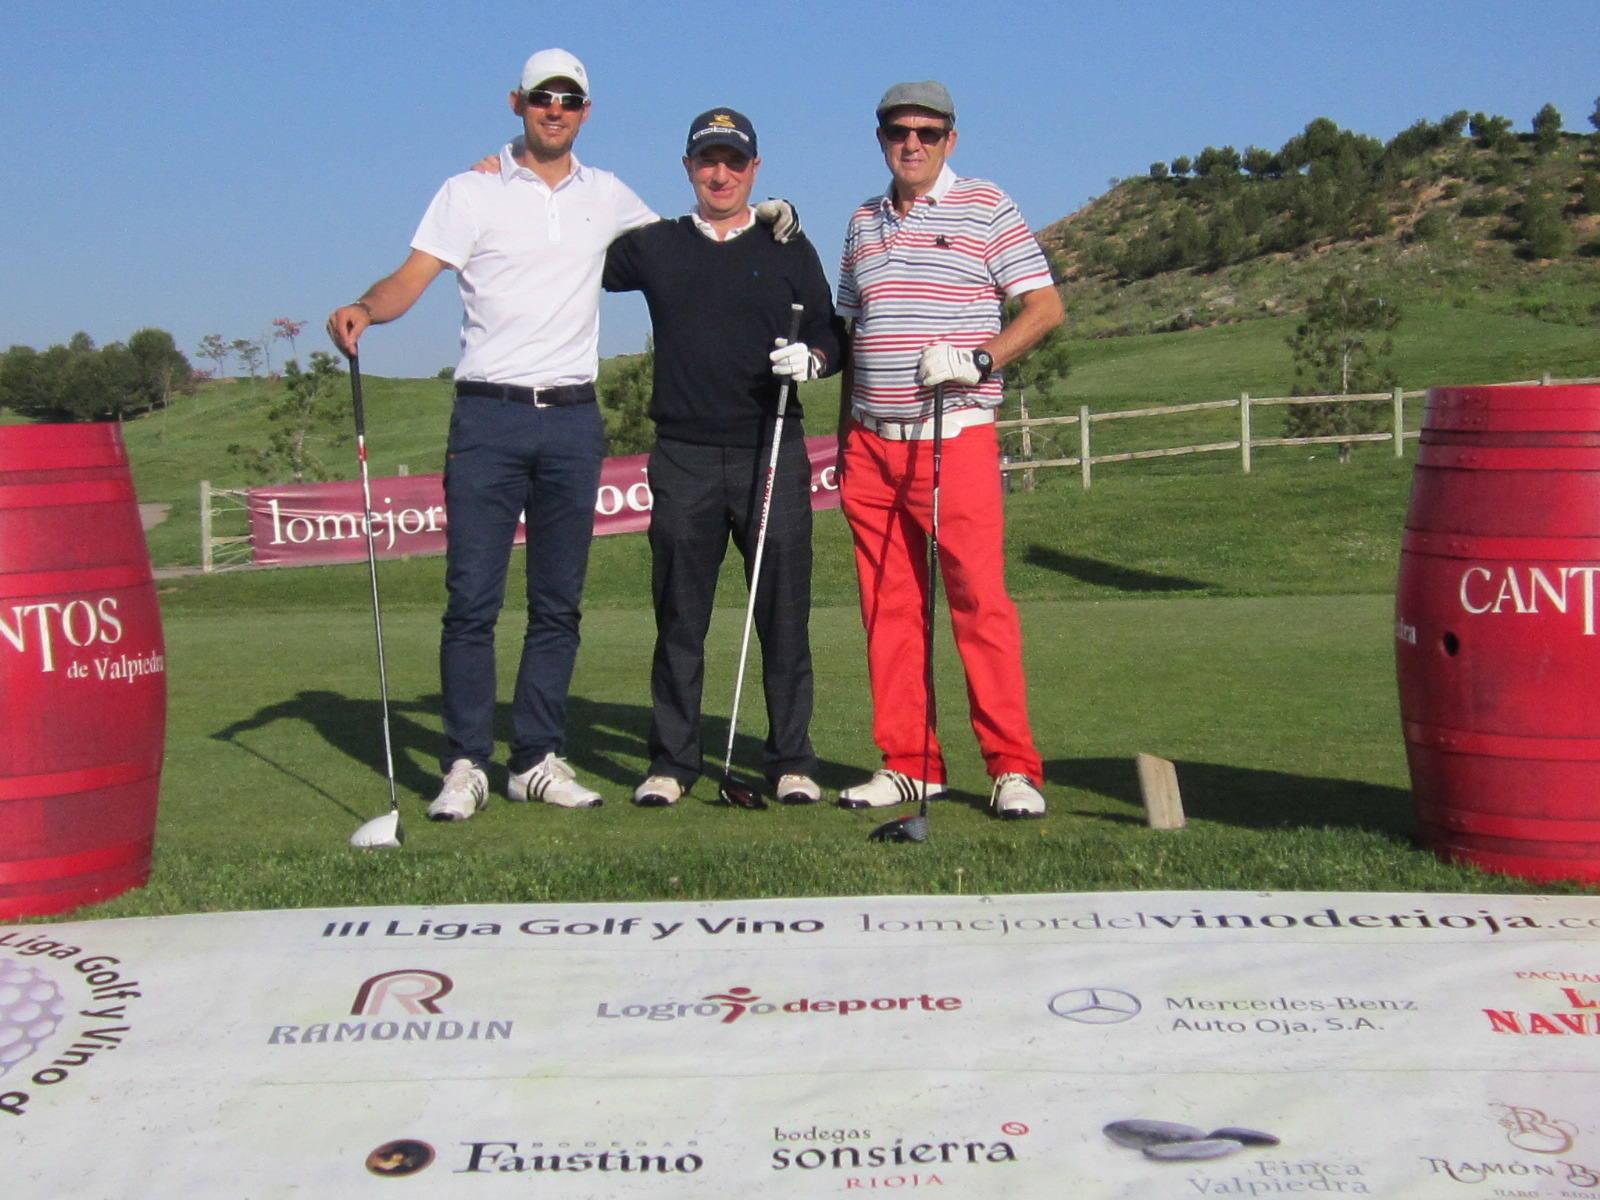 III Liga de Golf y Vino: Torneo Finca Valpiedra (Salida)